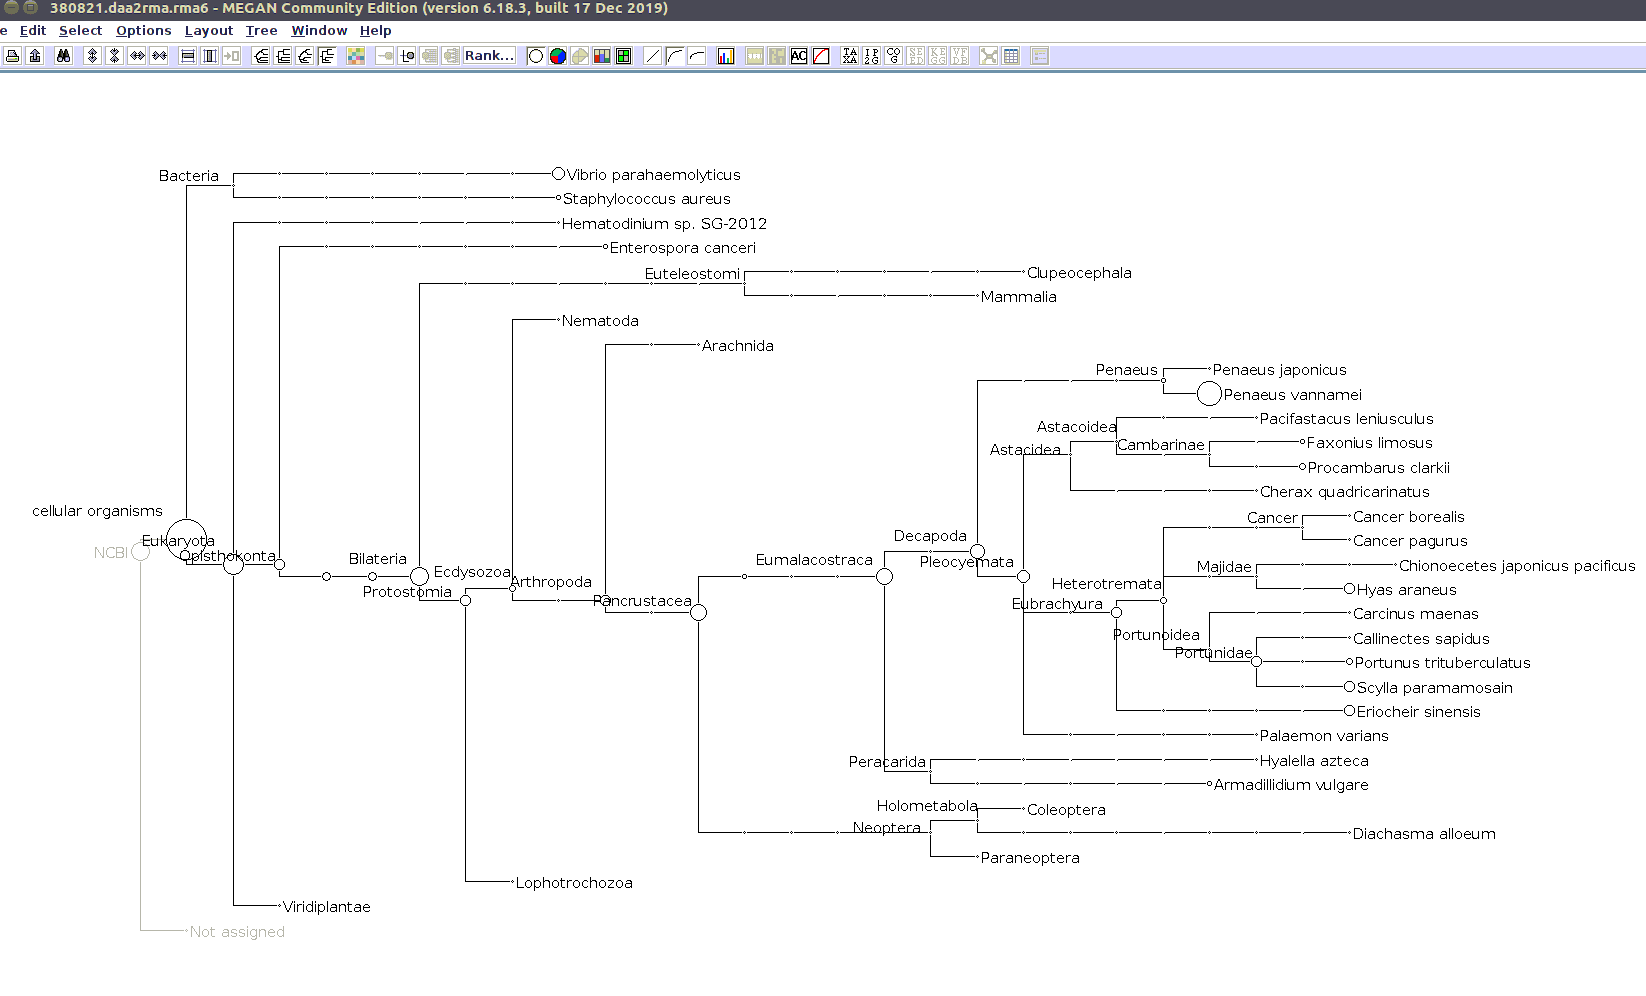 (MEGAN taxonomic tree for 380821